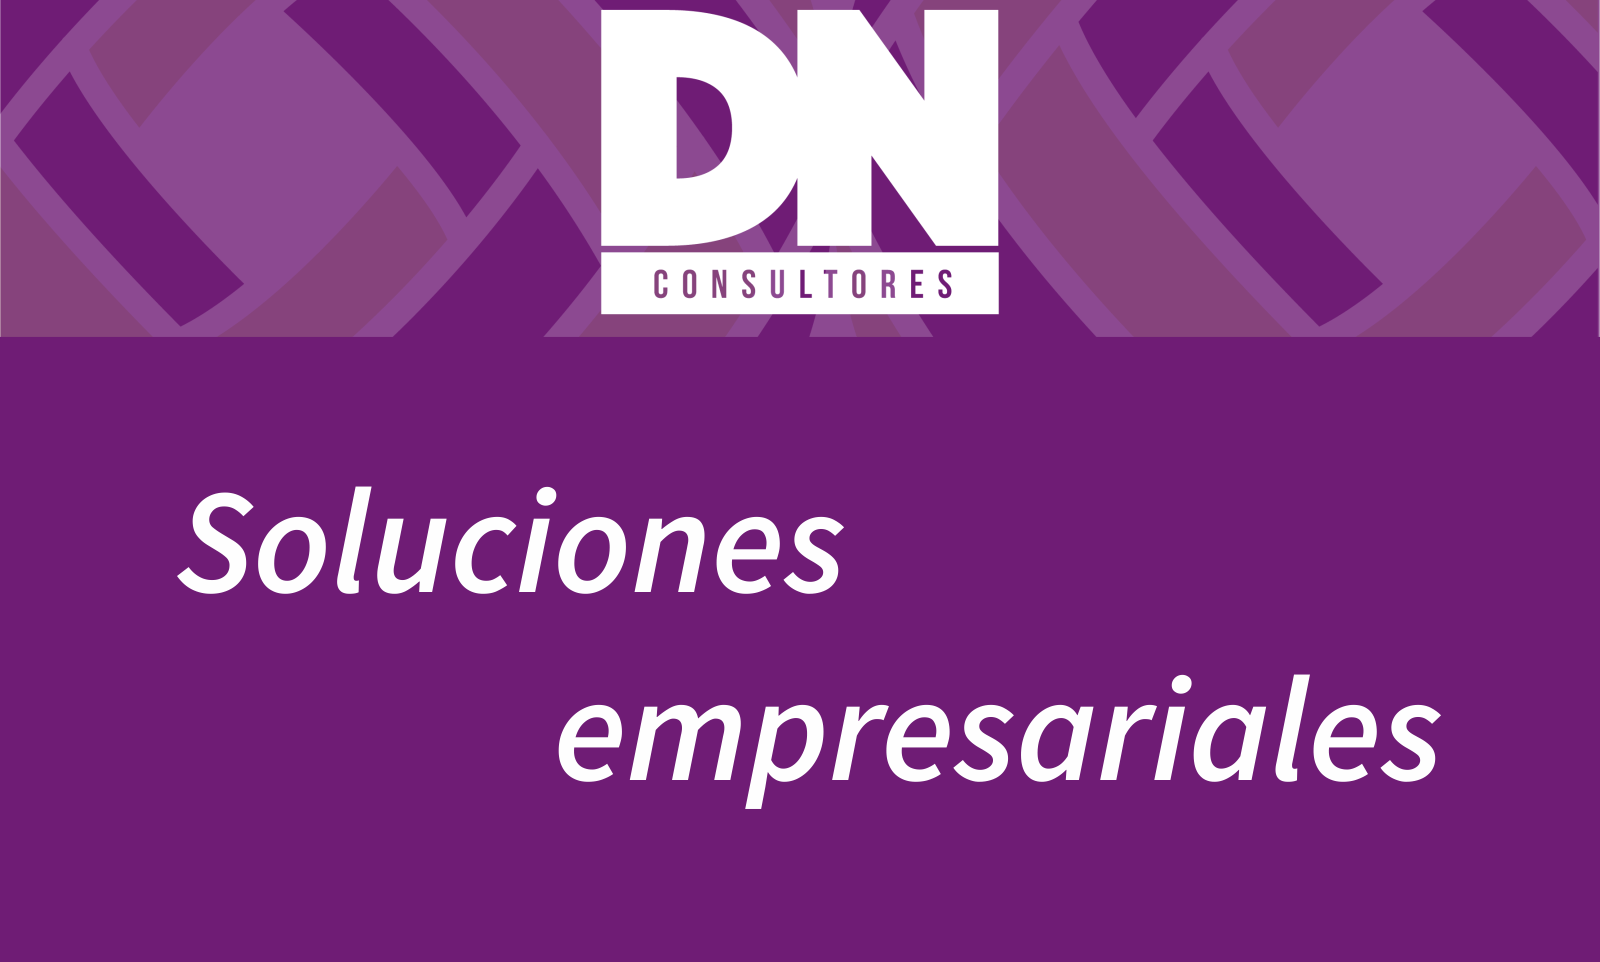 DN consultores